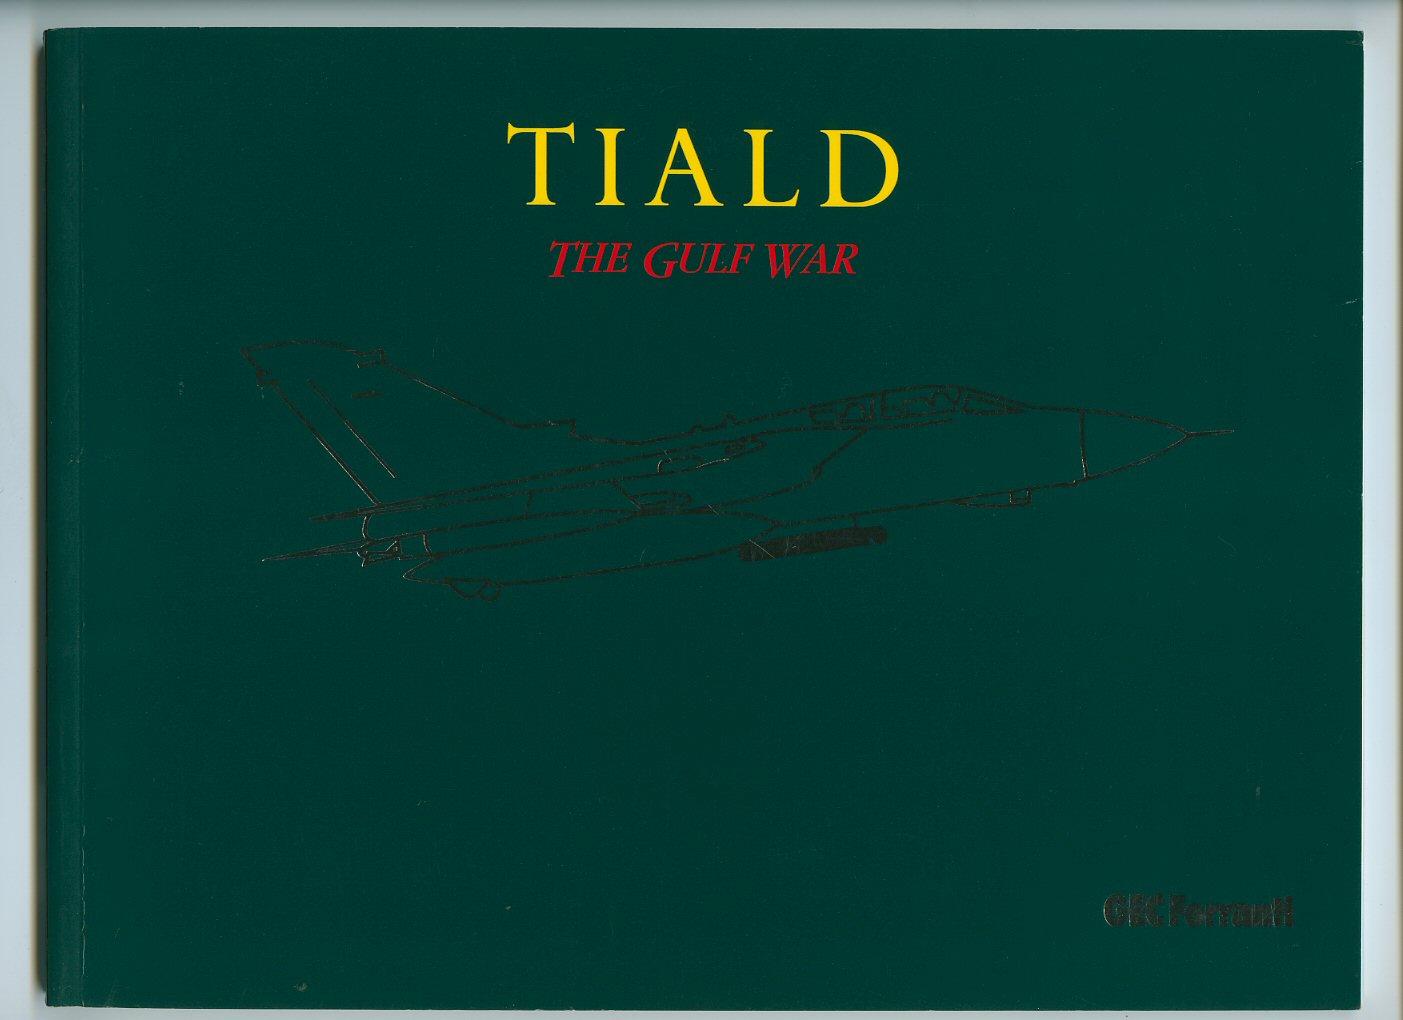 [GEC FERRANTI] - Tiald [Thermal Imaging Airborne Laser Designator]: The Gulf War [GEC Ferranti]